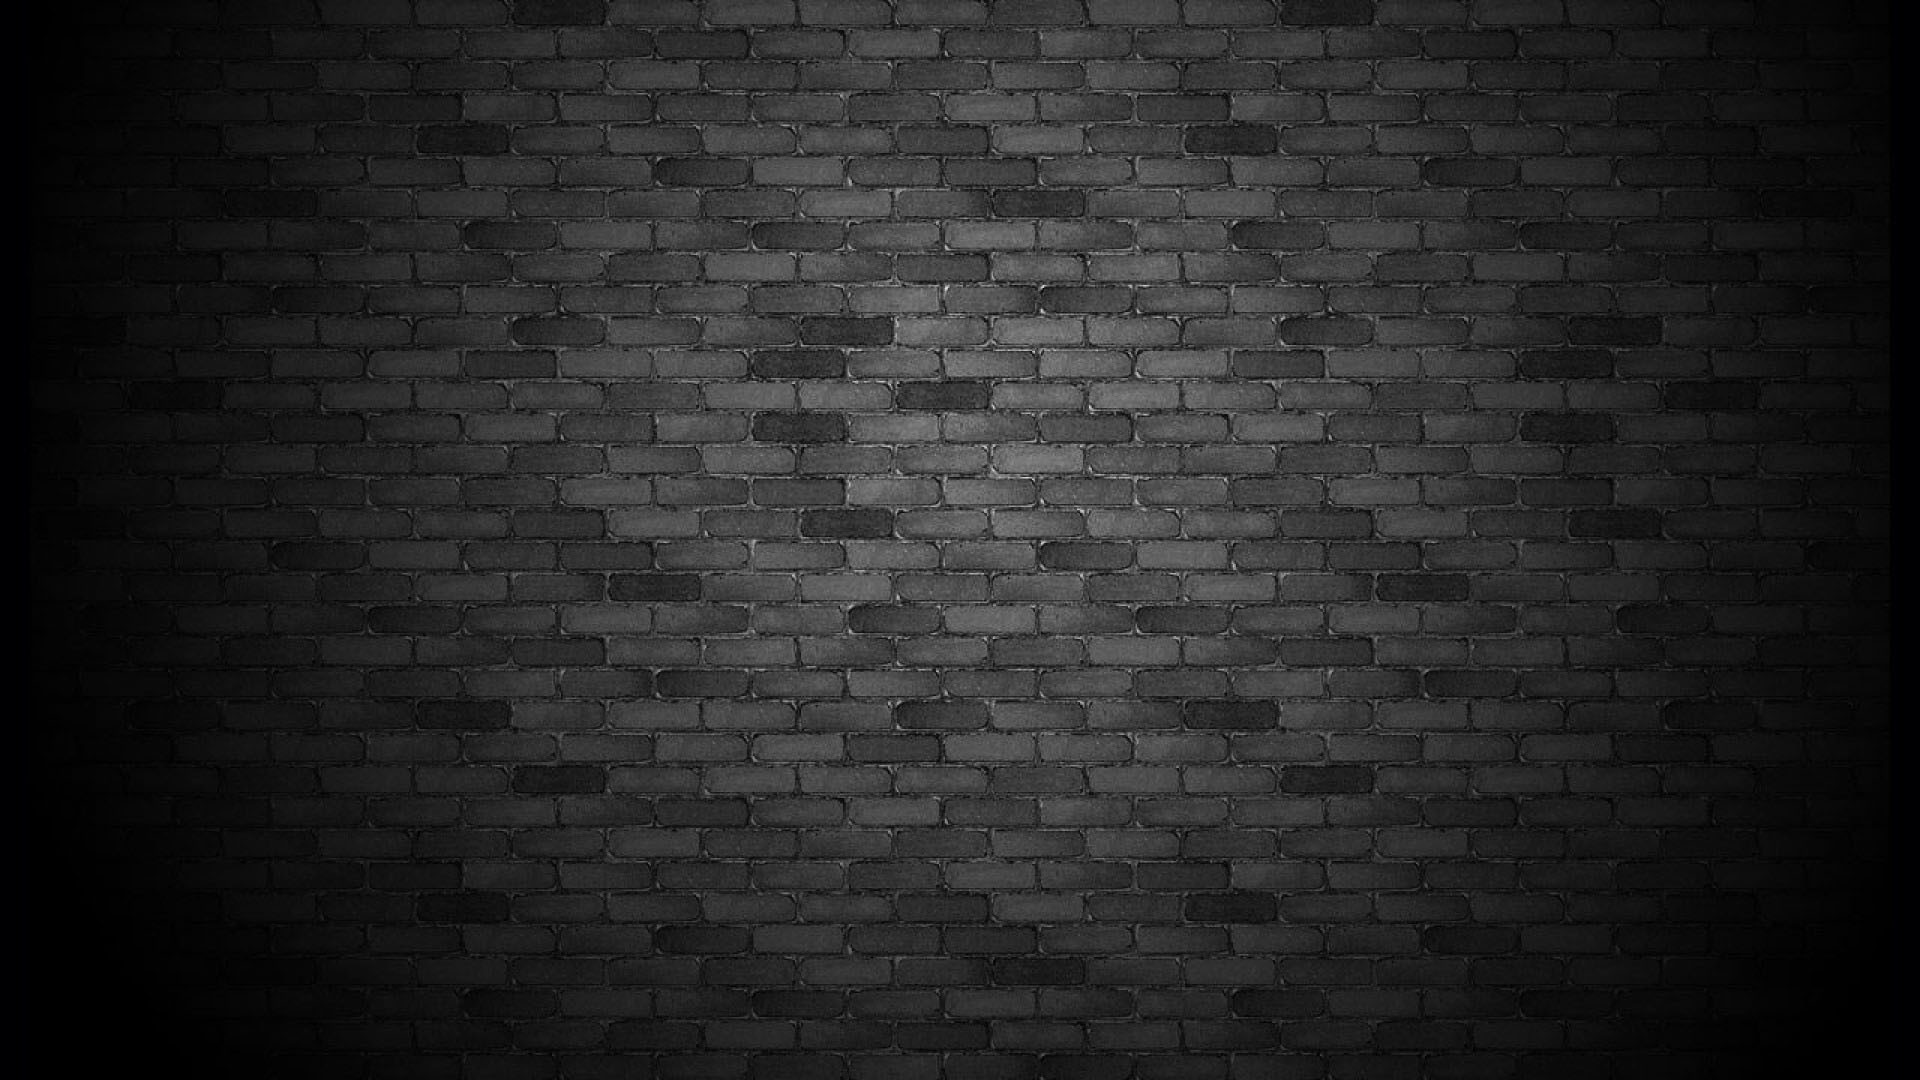 … Home Design : Brick Wall Black And White Wallpaper Subway Tile Baby  brick wall black and …